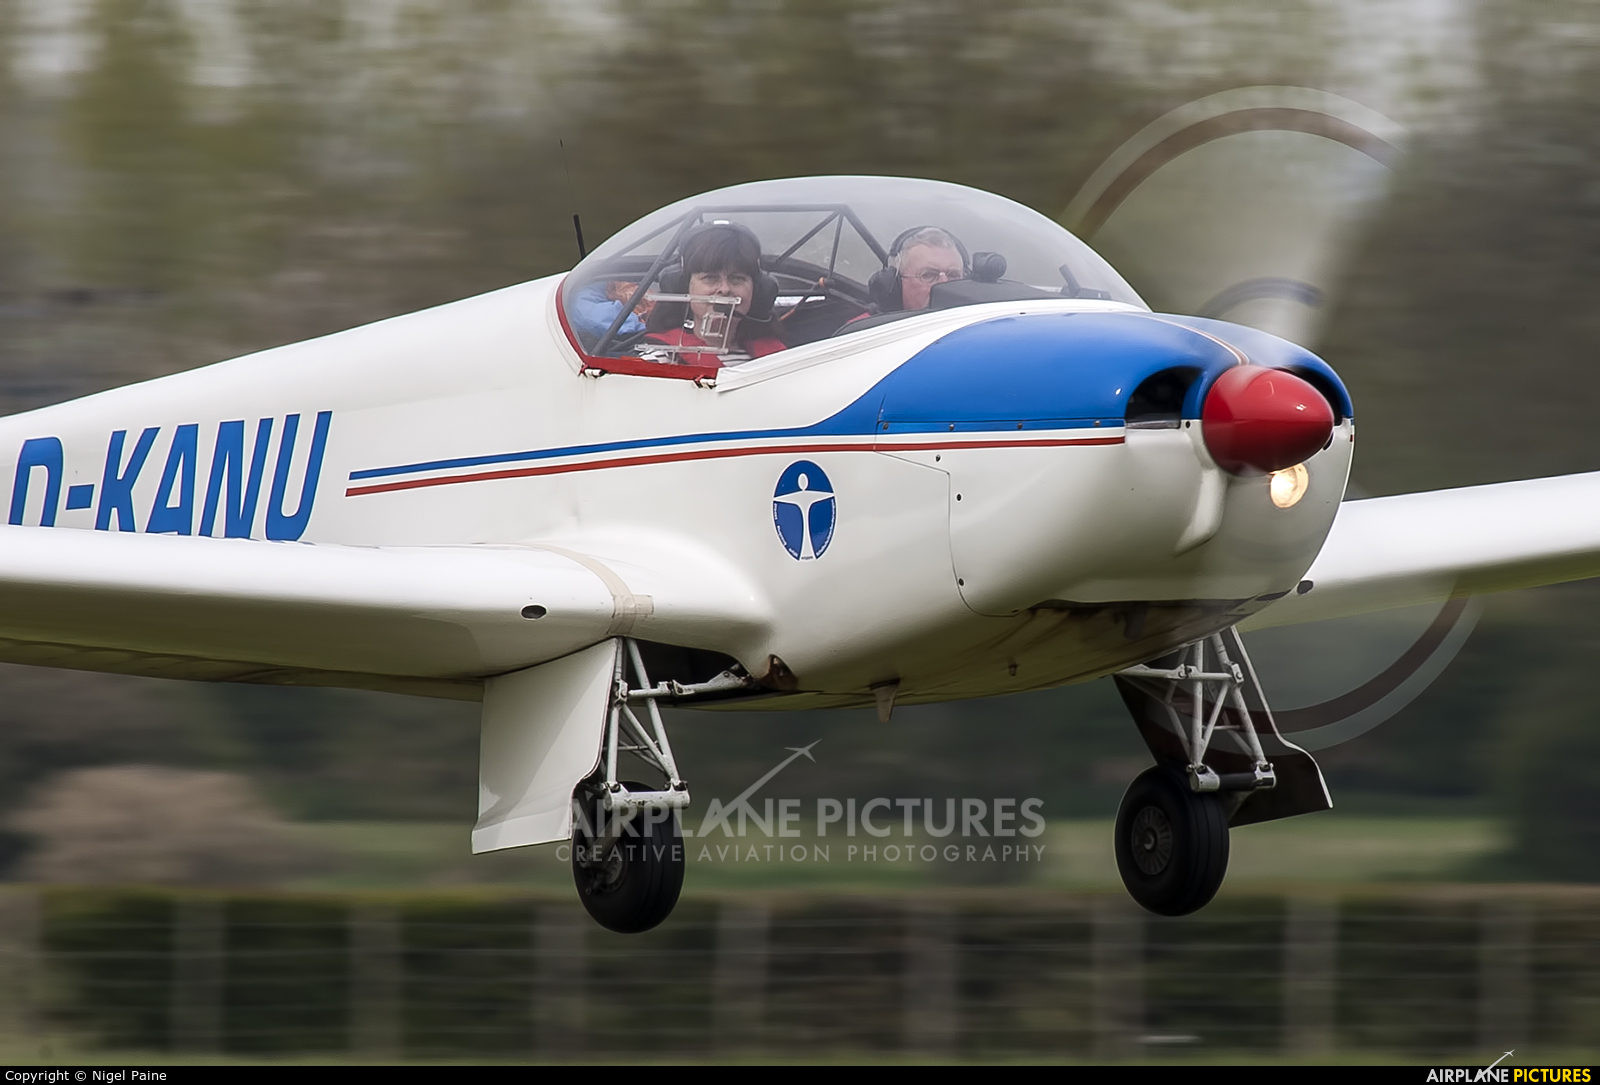 Private D-KANU aircraft at Lashenden / Headcorn